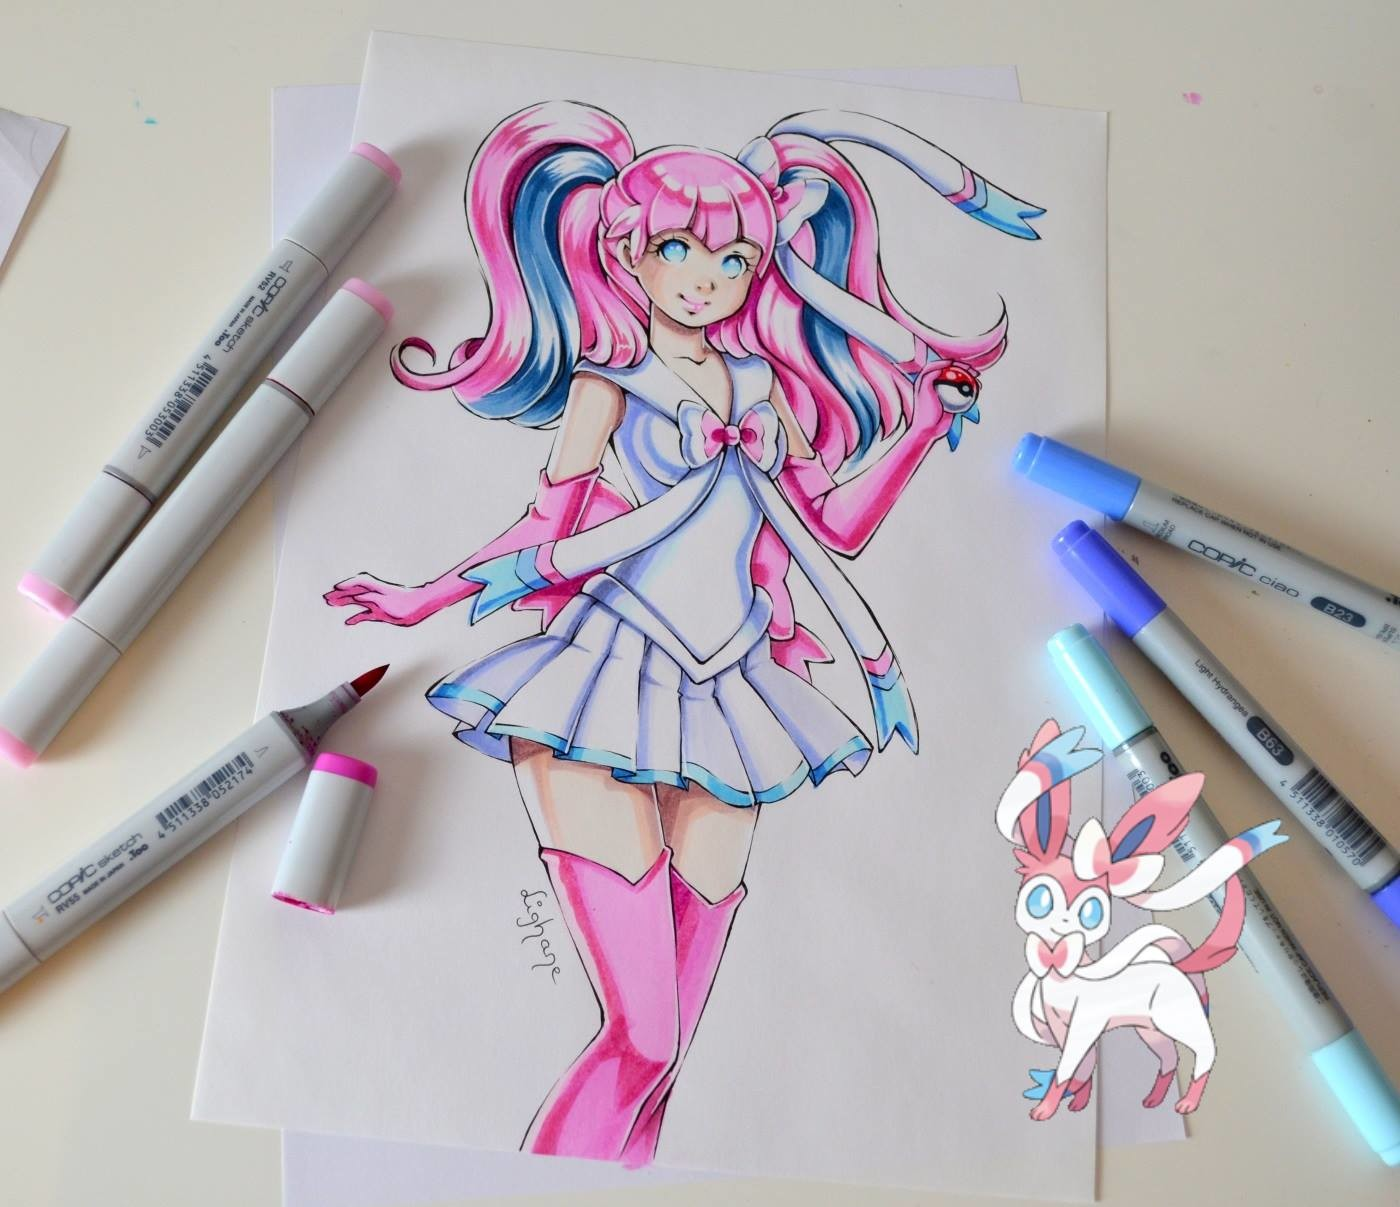 Lighane S Artblog Sailor Sylveon Coloring Book Project Copic Marker